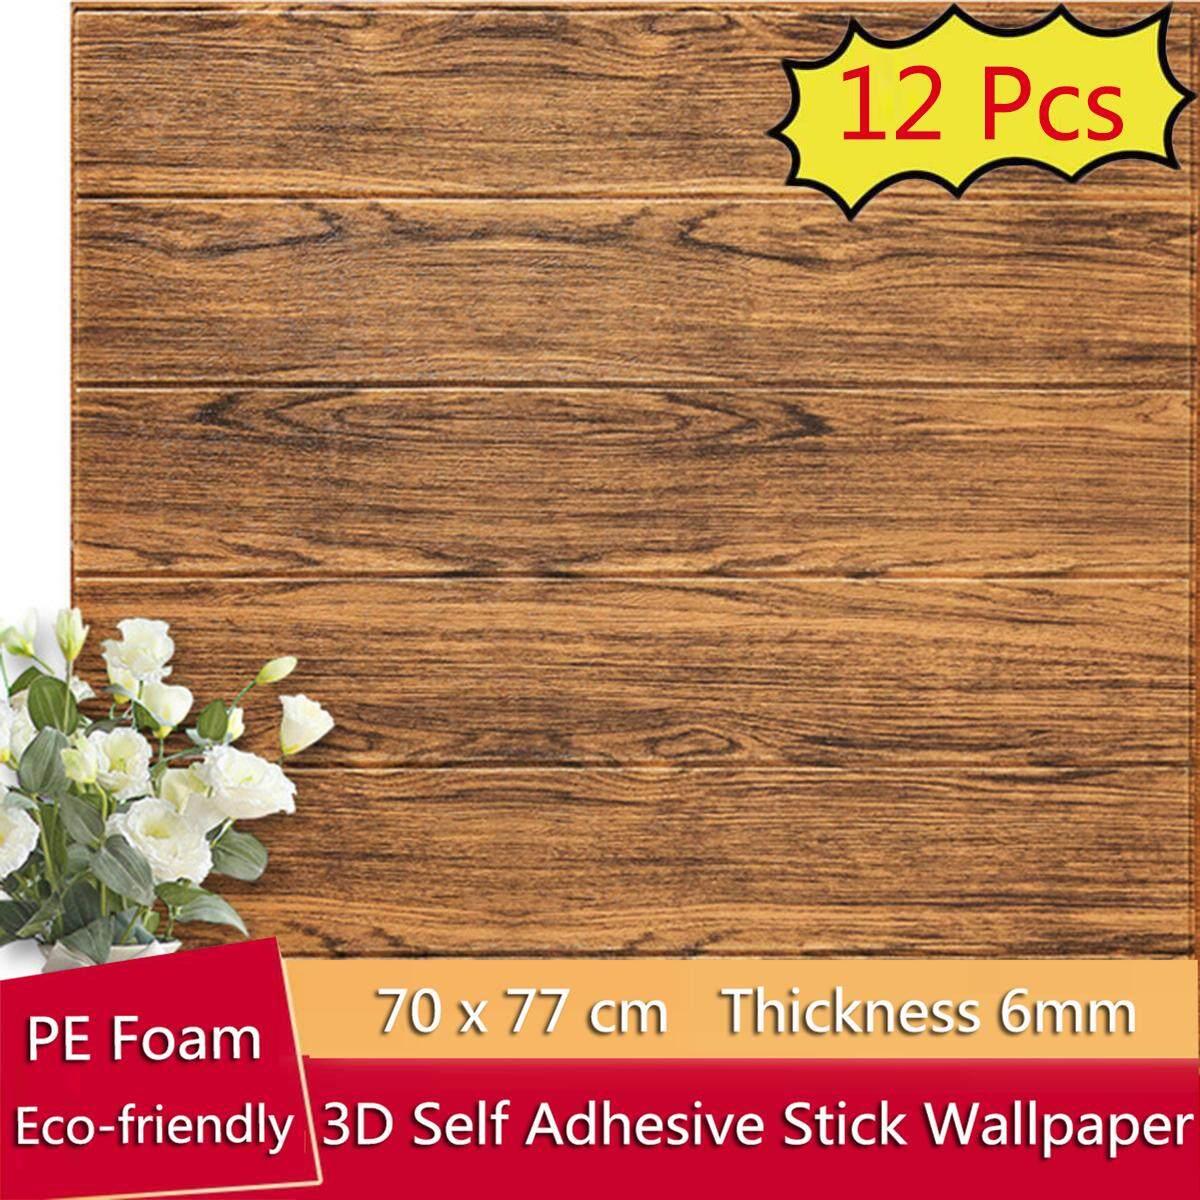 12 PCS/Set 3D wood grain wallpaper, 70 * 70 size, wall mounted brick pattern, 3D brick wall wallpaper, decorated with sponge [3D Wallpaper]